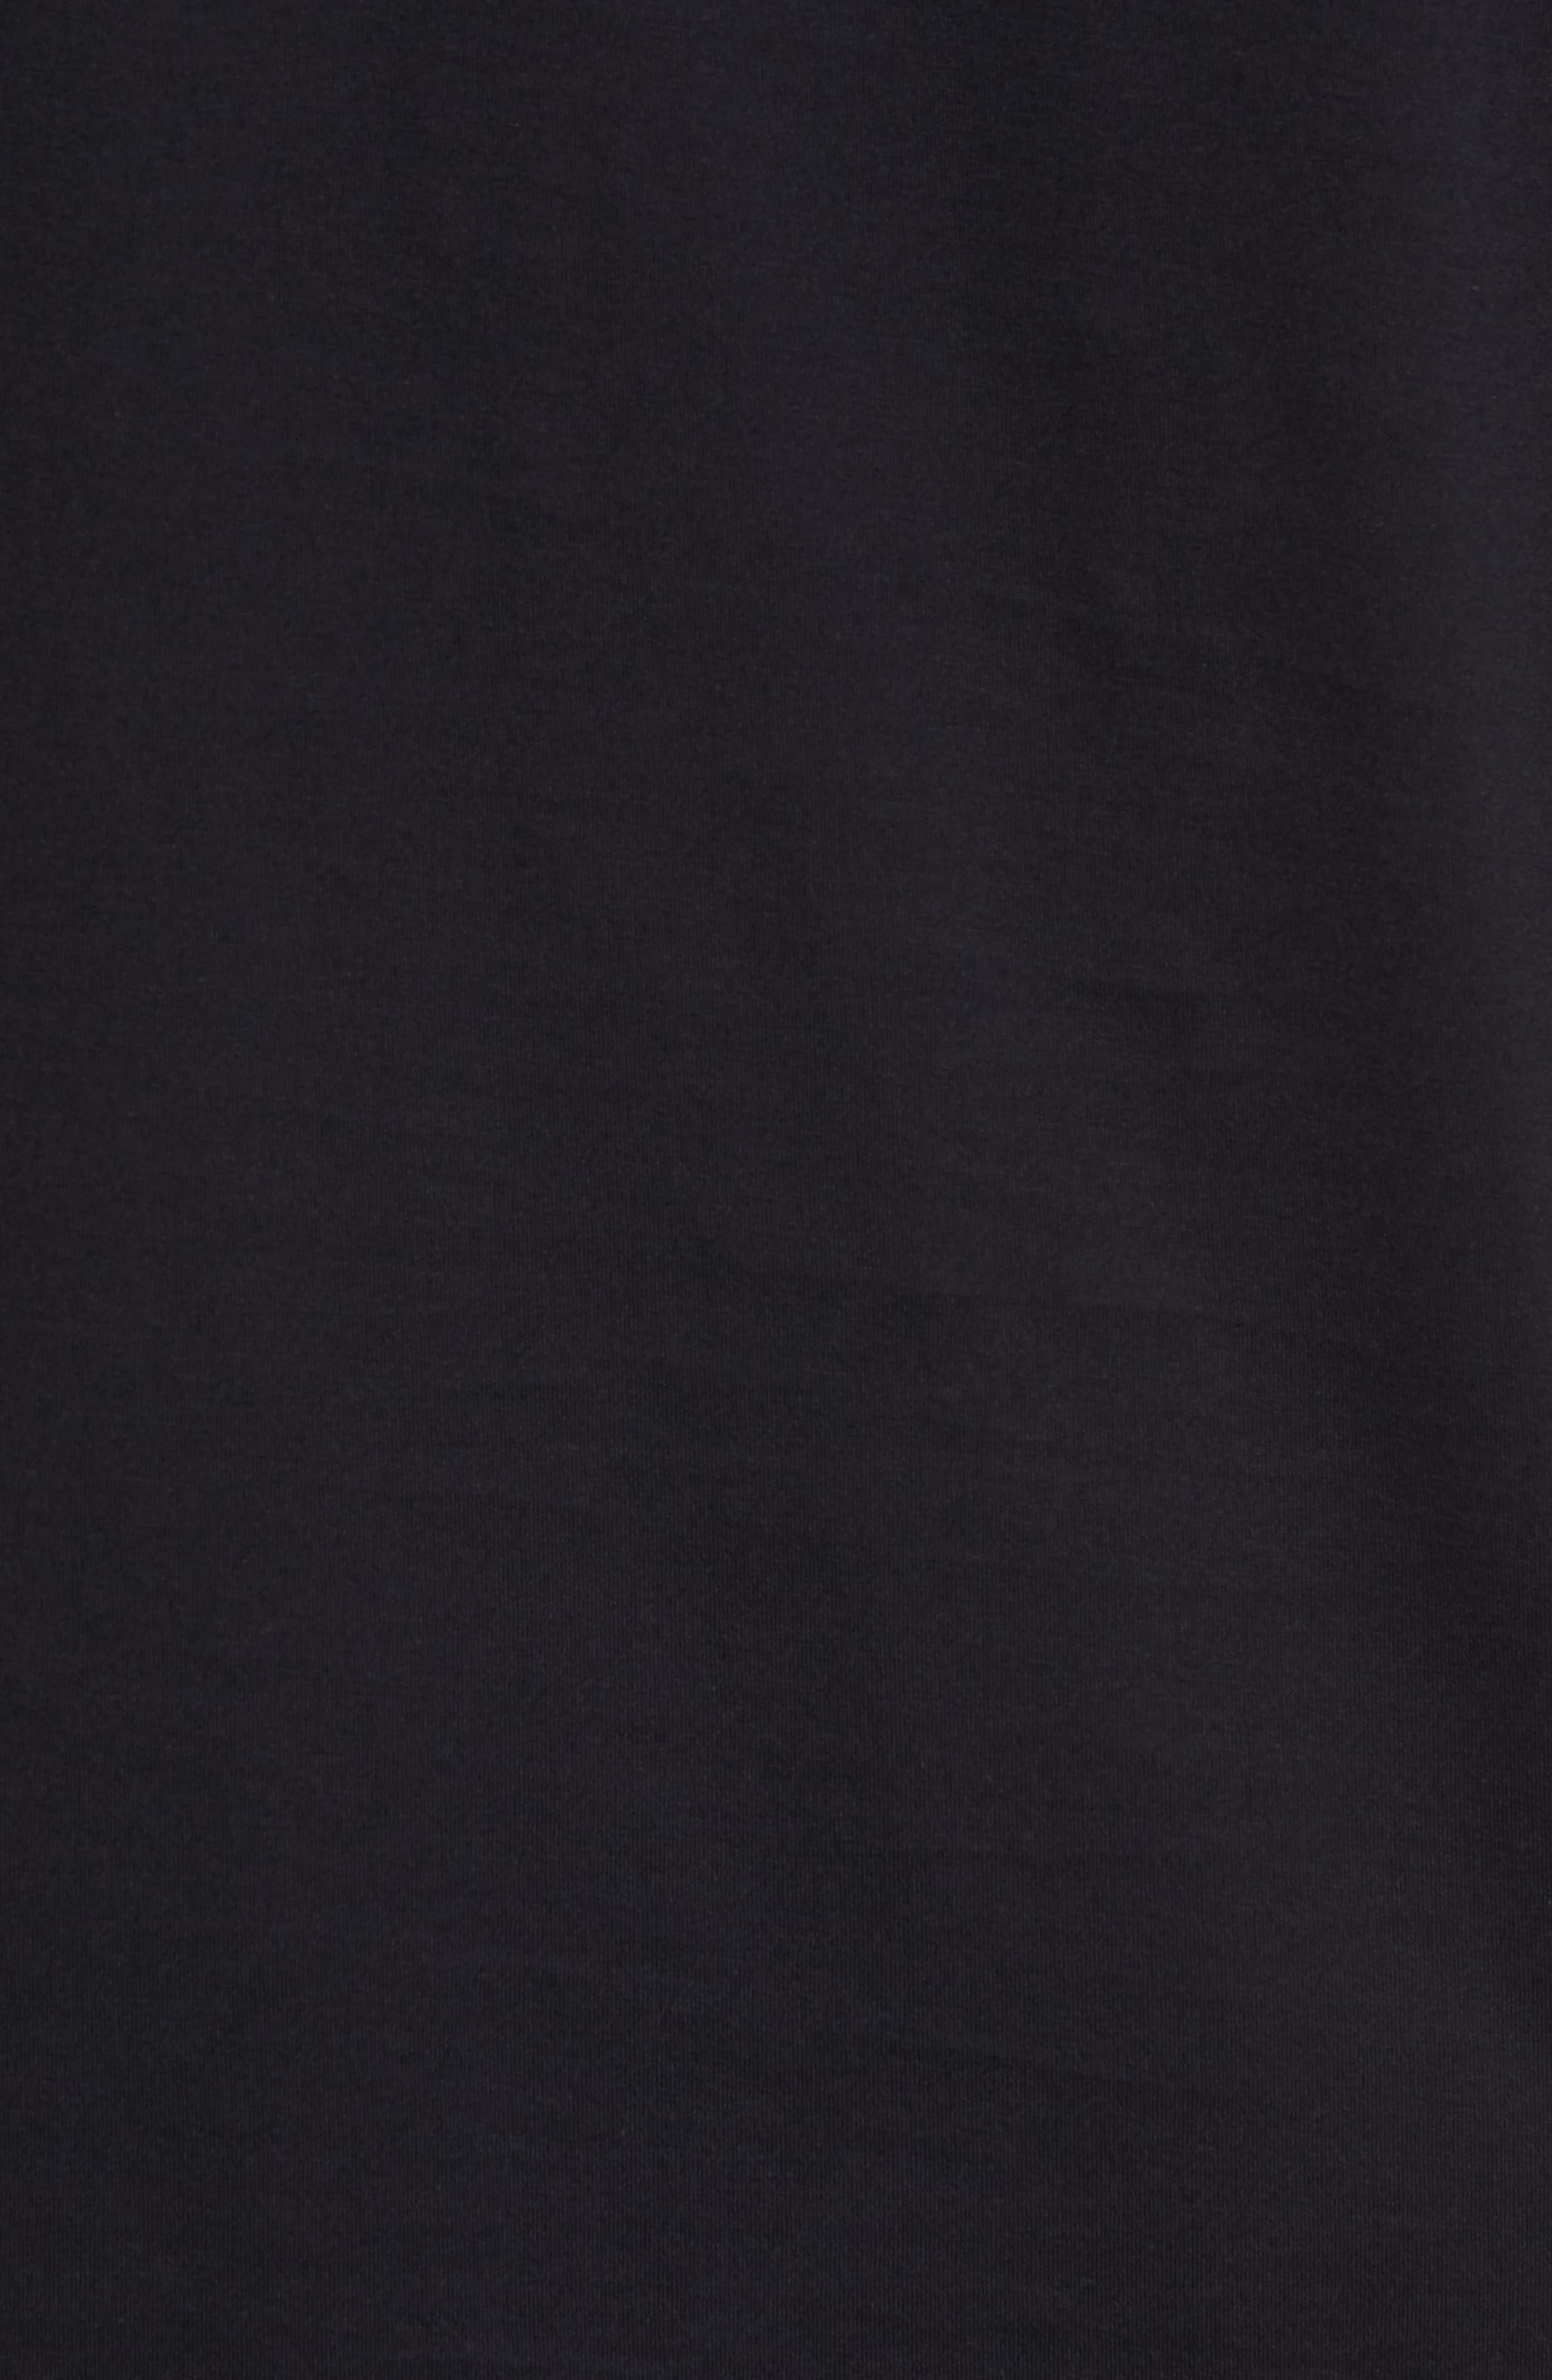 Night & Day Crewneck T-Shirt,                             Alternate thumbnail 5, color,                             BLACK